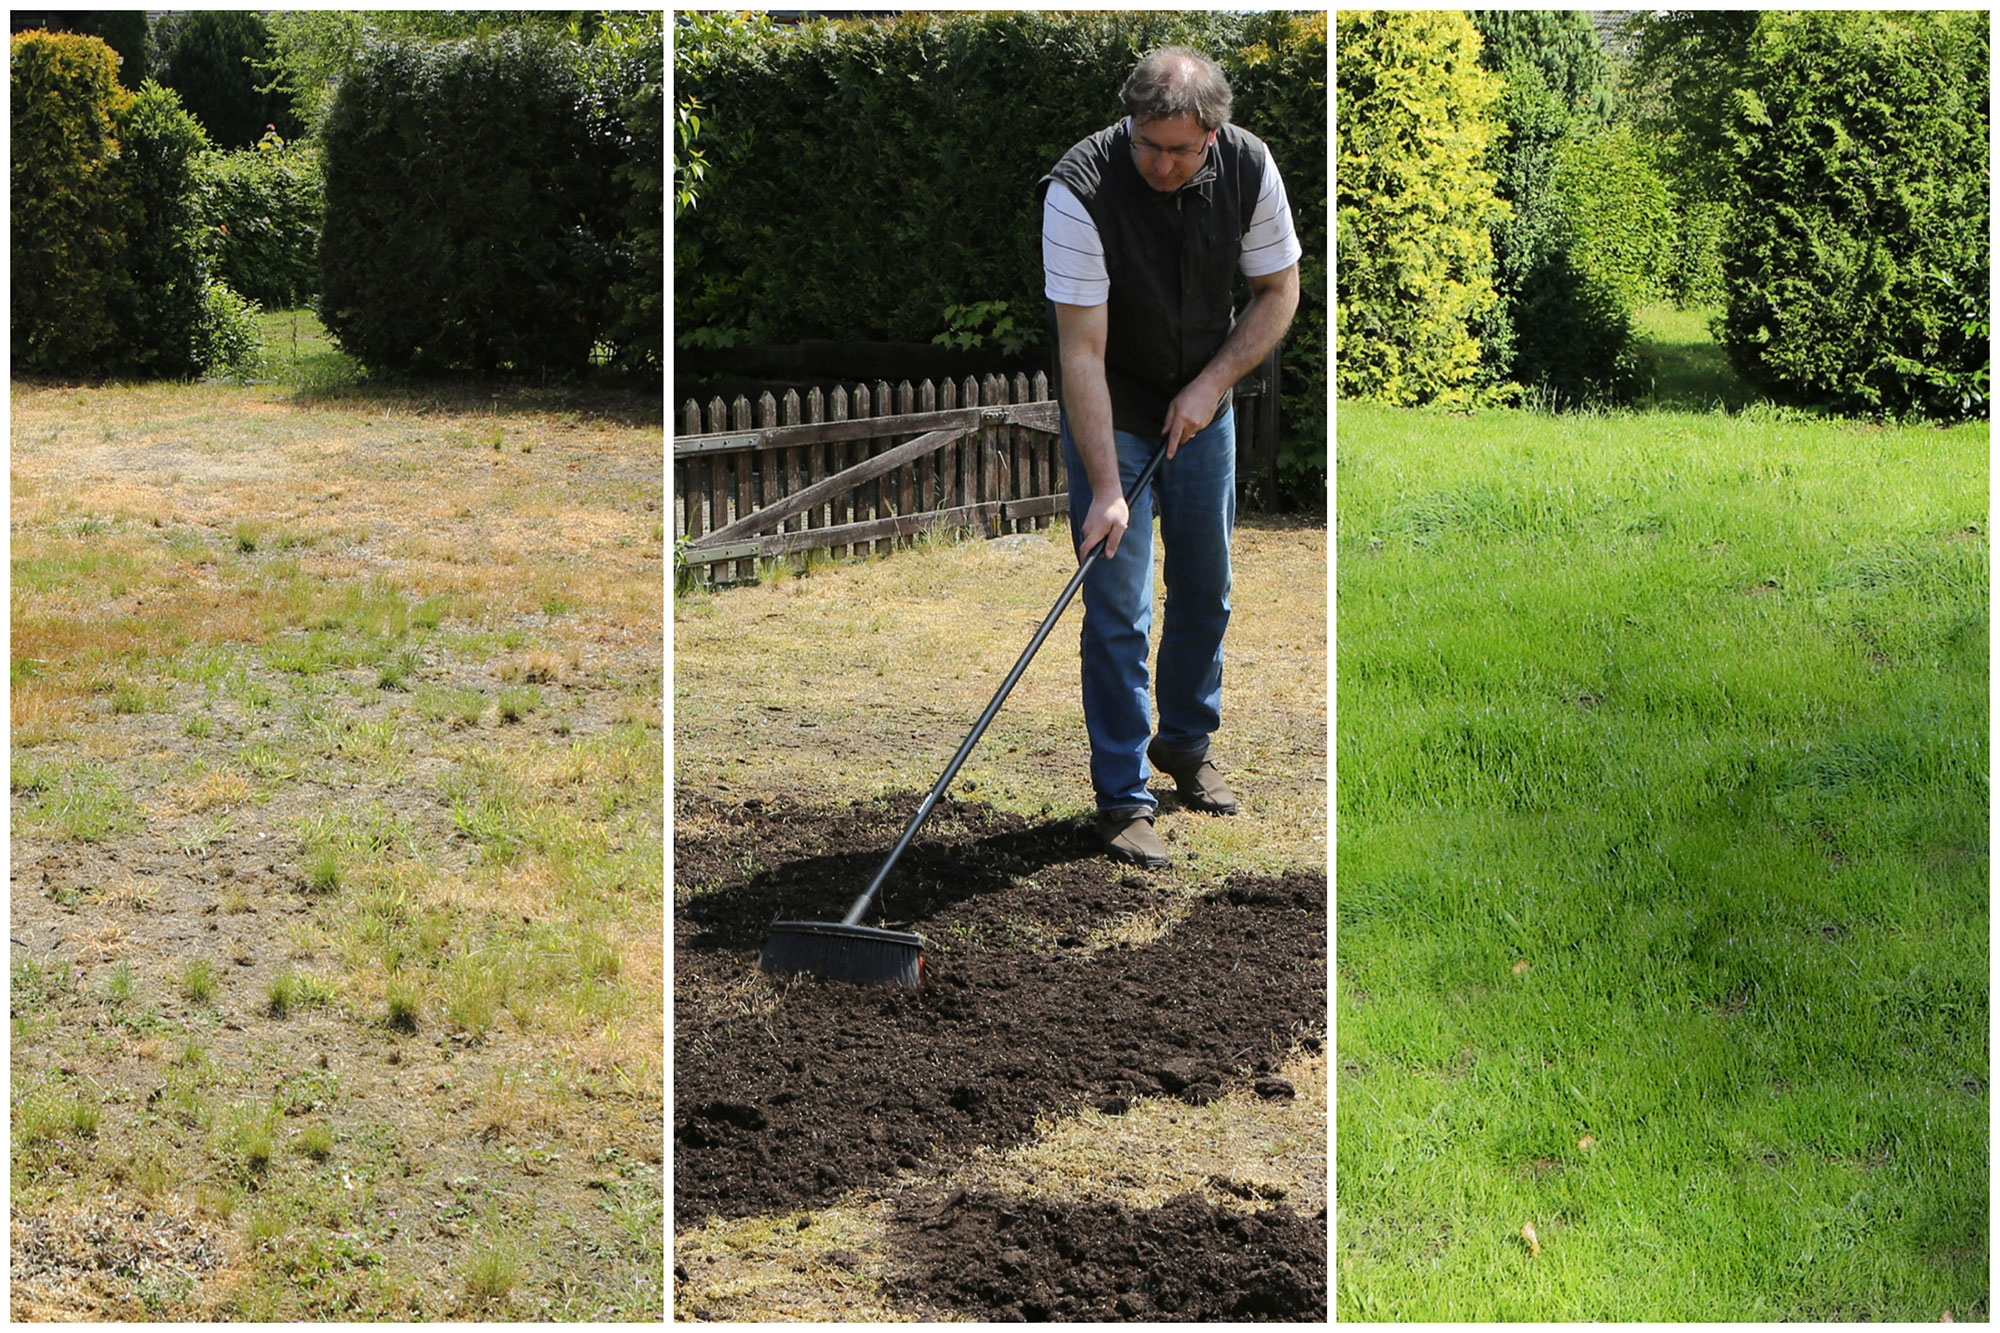 Geheim-Tipp für den hitzegeschädigten Rasen